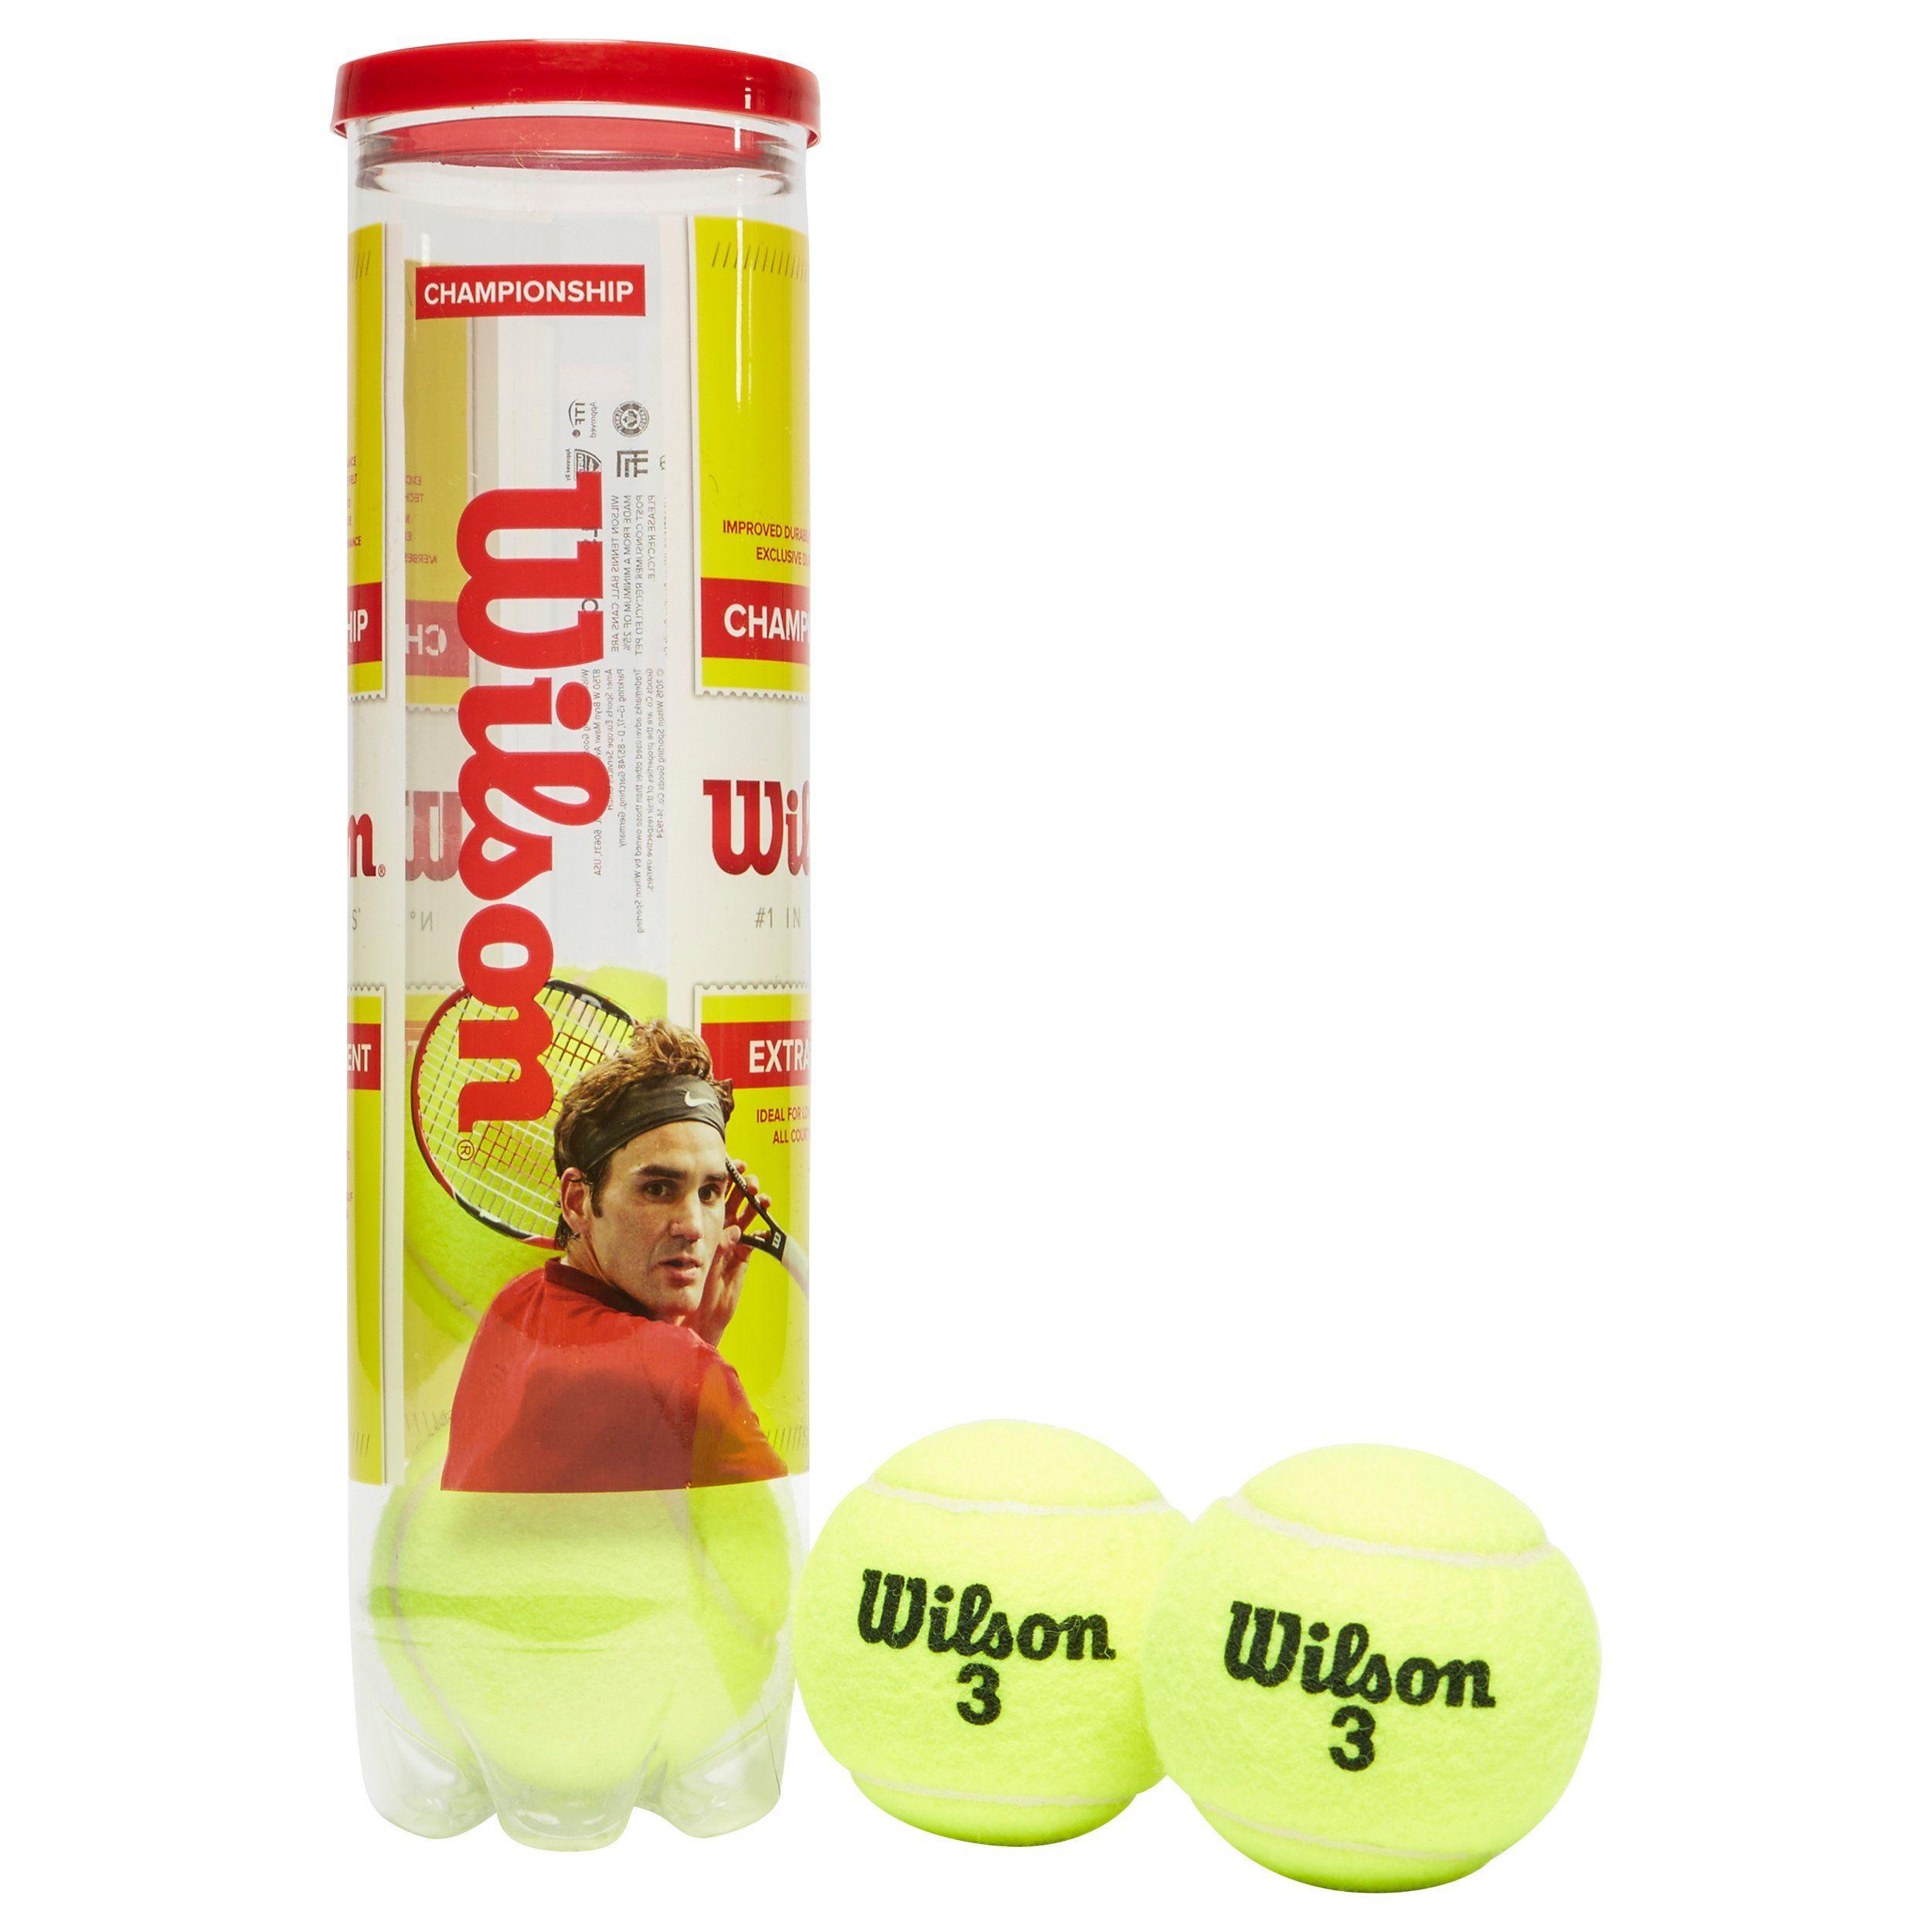 Wilson Championship Extra Duty Tennis Ball Can (4 Ball Can)